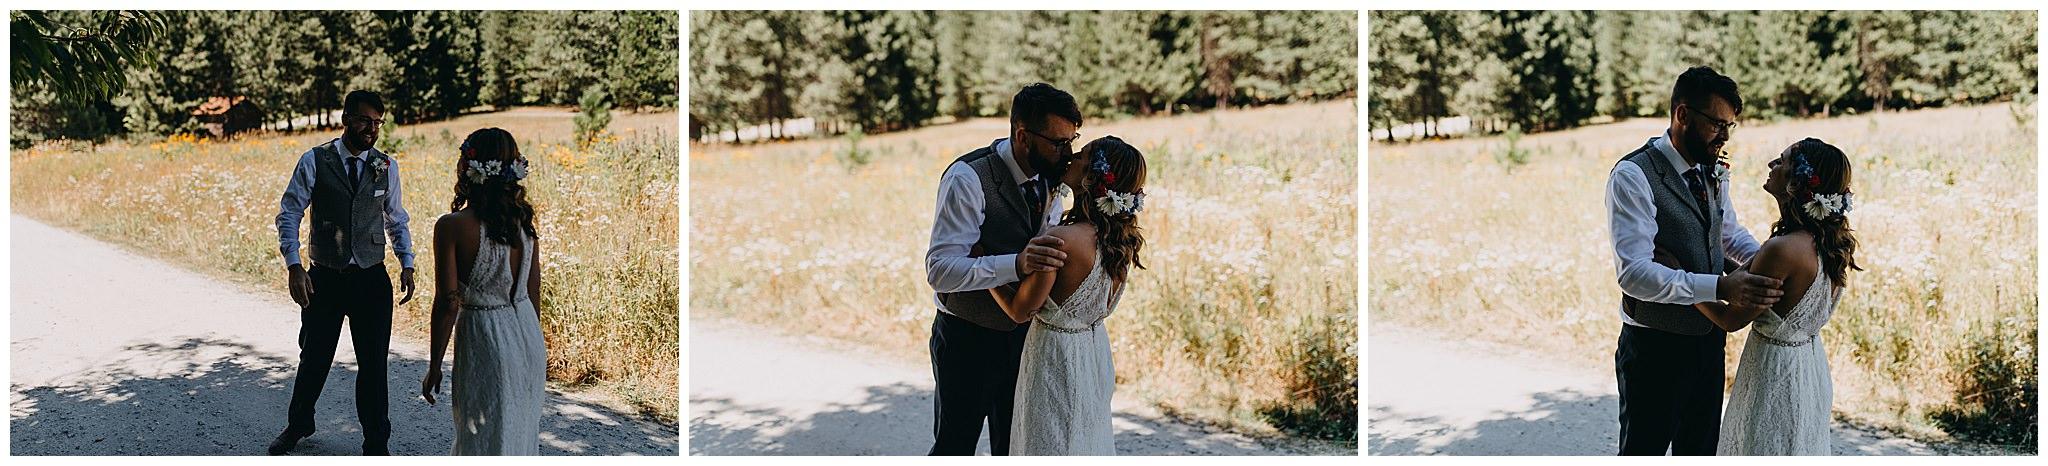 brown-family-homestead-wedding-tyler-elyse10.jpg